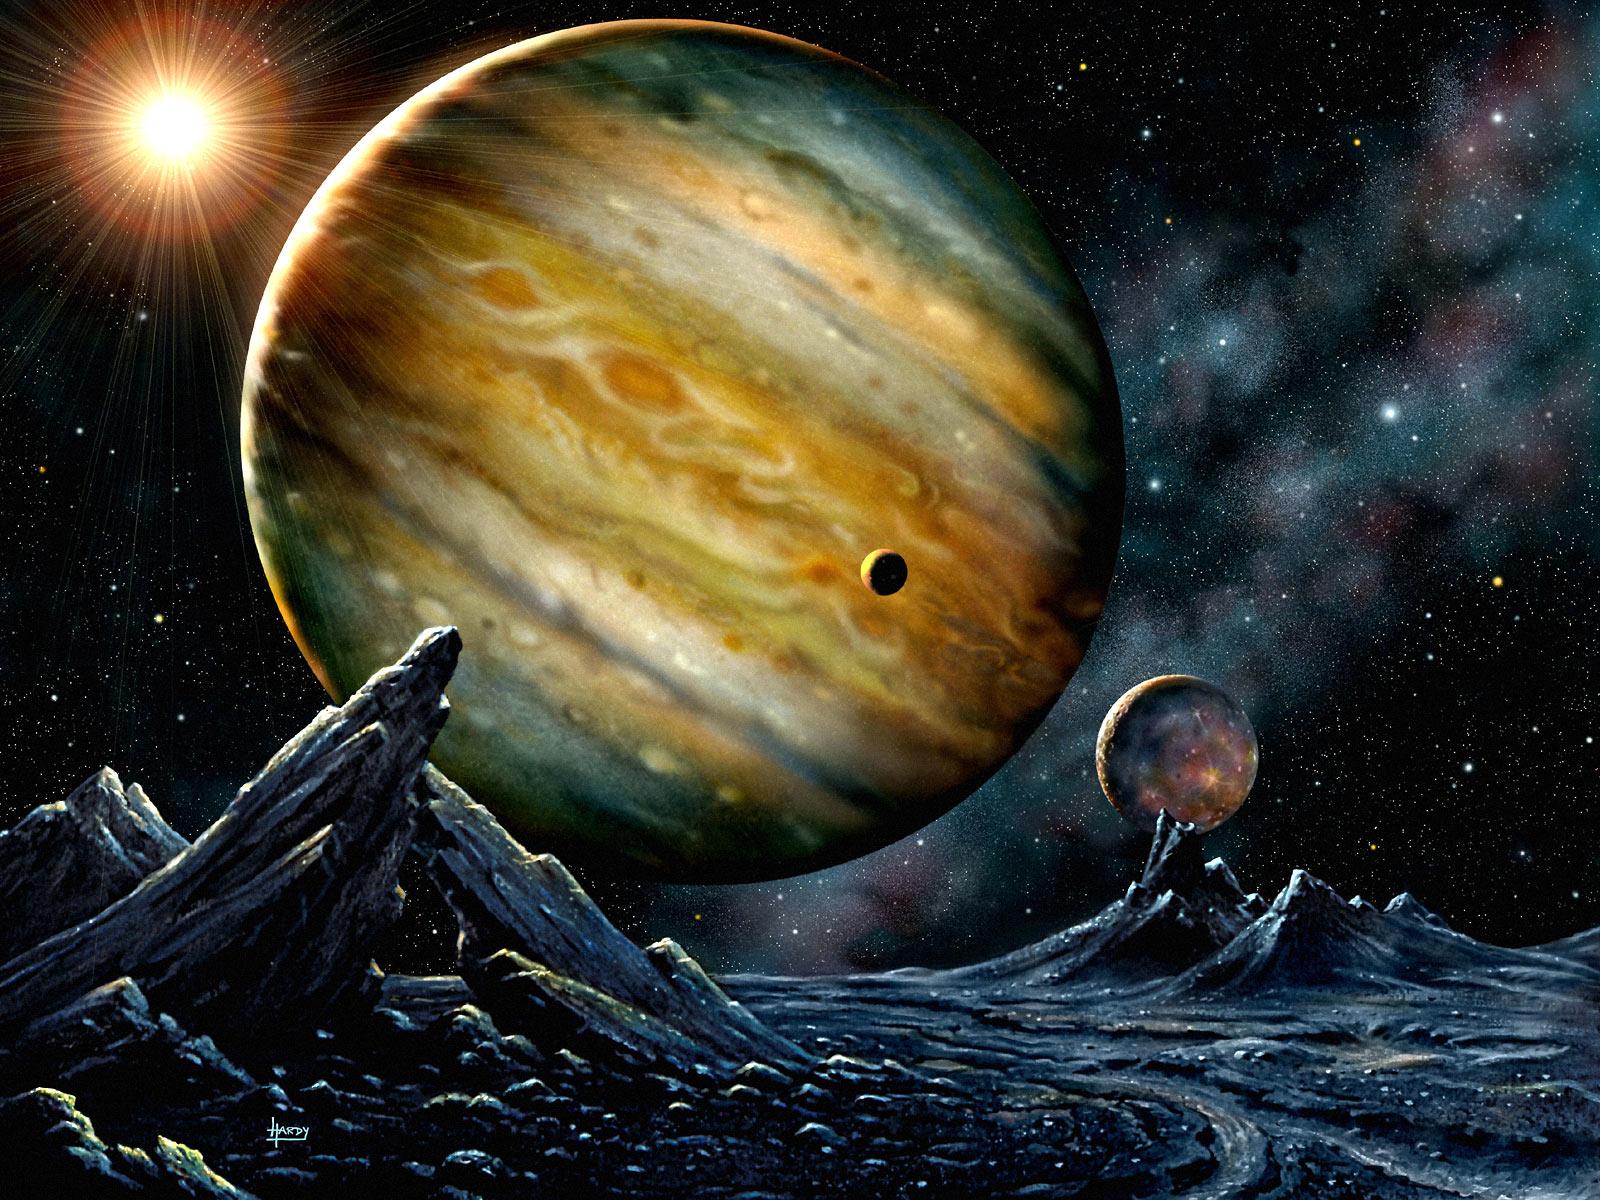 hd planet wallpapers hd wallpaper planet wallpaper hd planets 1600x1200